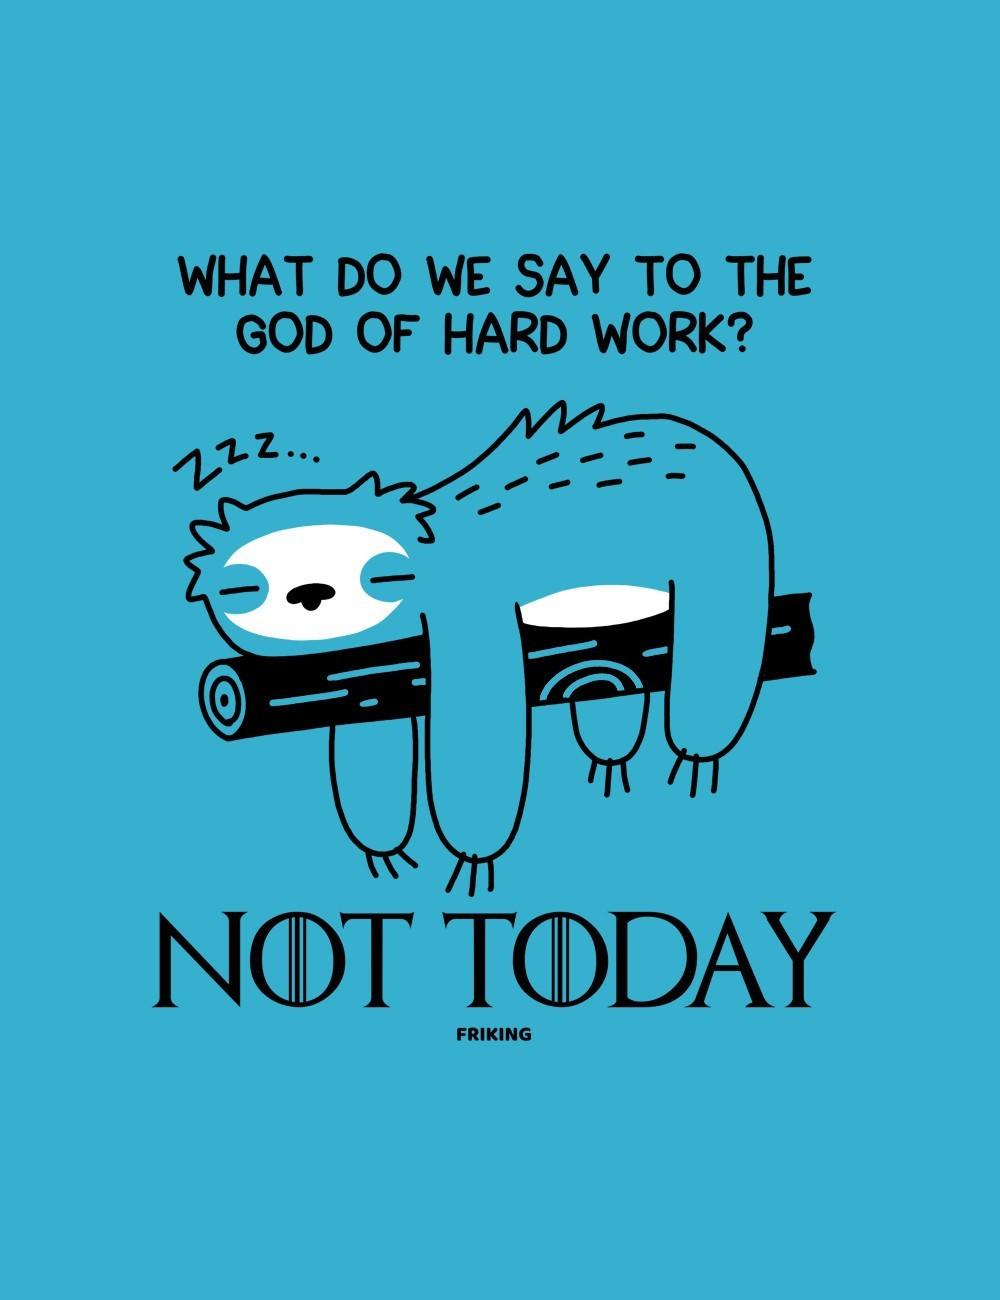 God of Hard Work